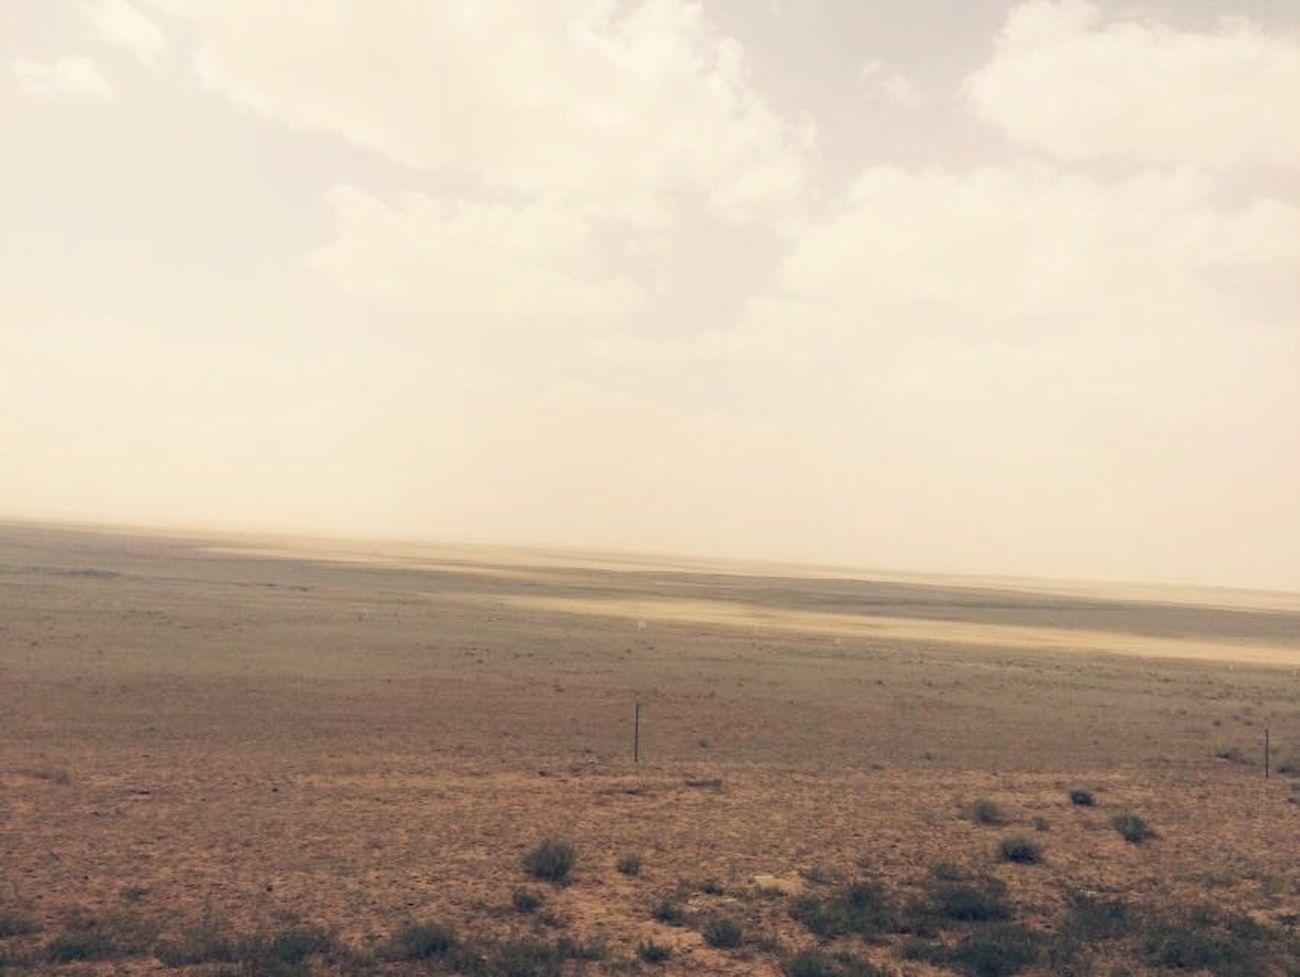 Edge Of The World 内蒙古广袤无垠的草原与天空相连。